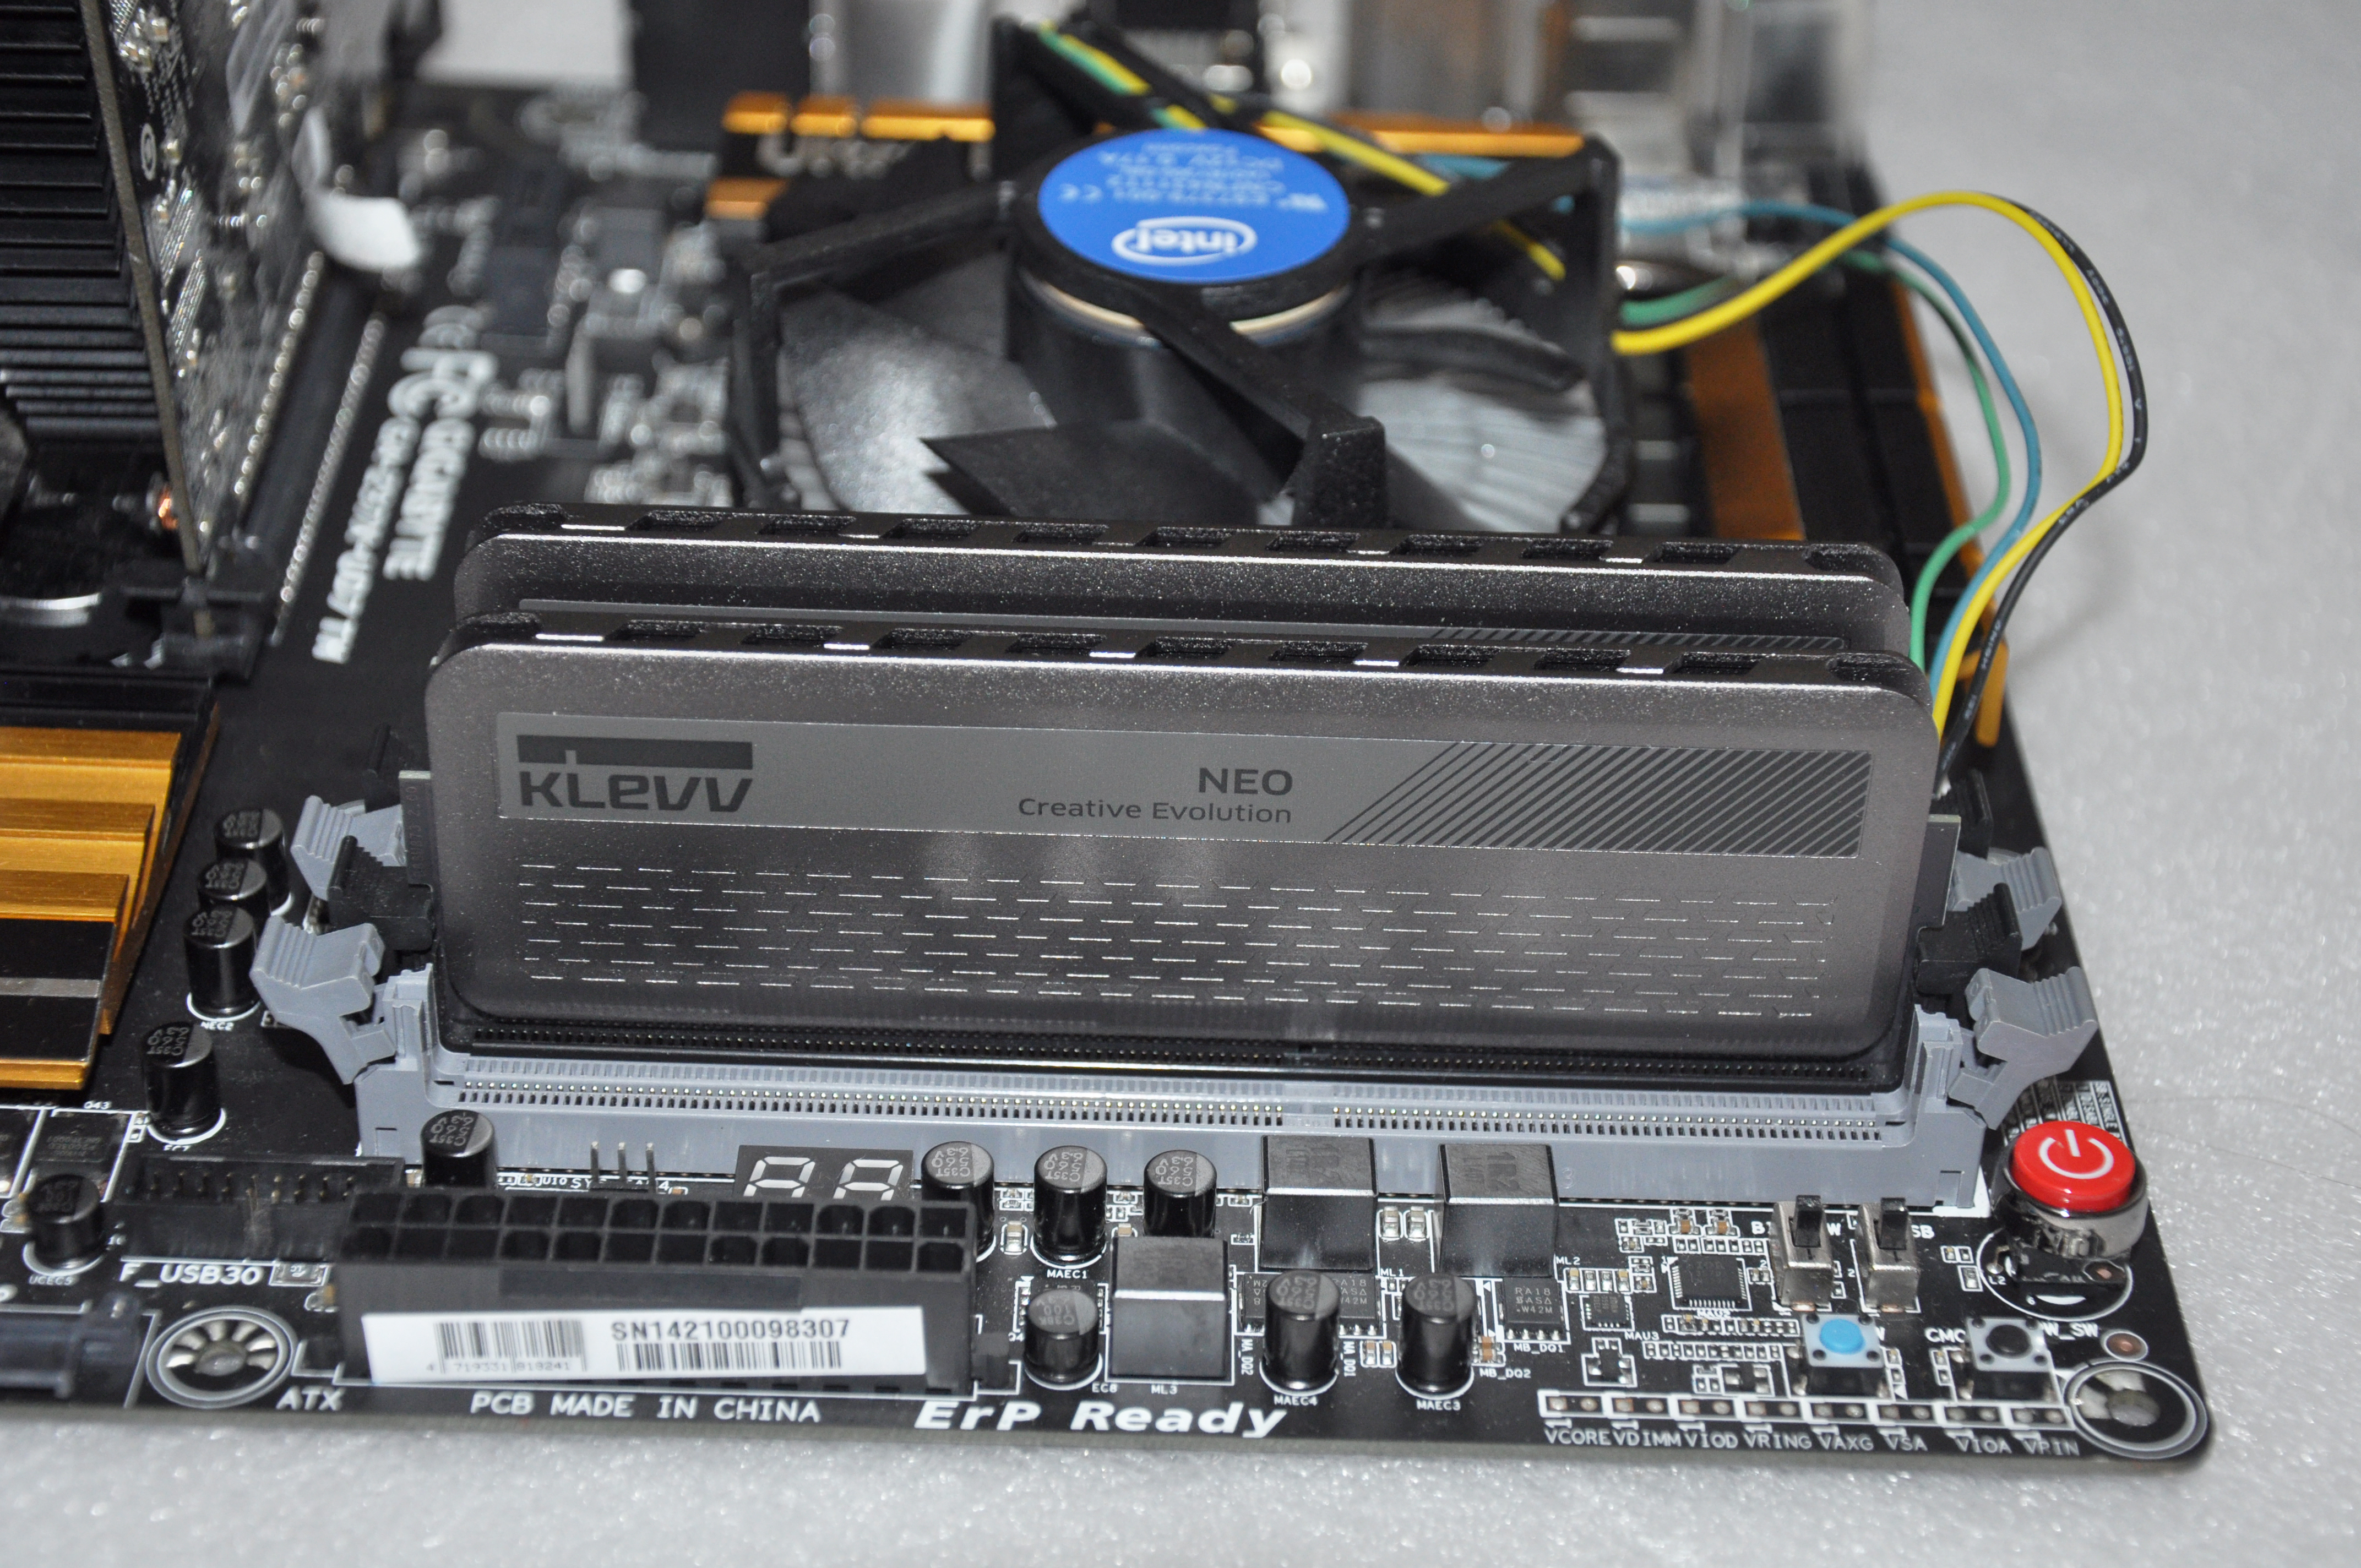 Review KLEVV Neo 2X4 GB DDR3 1866 Mhz 410